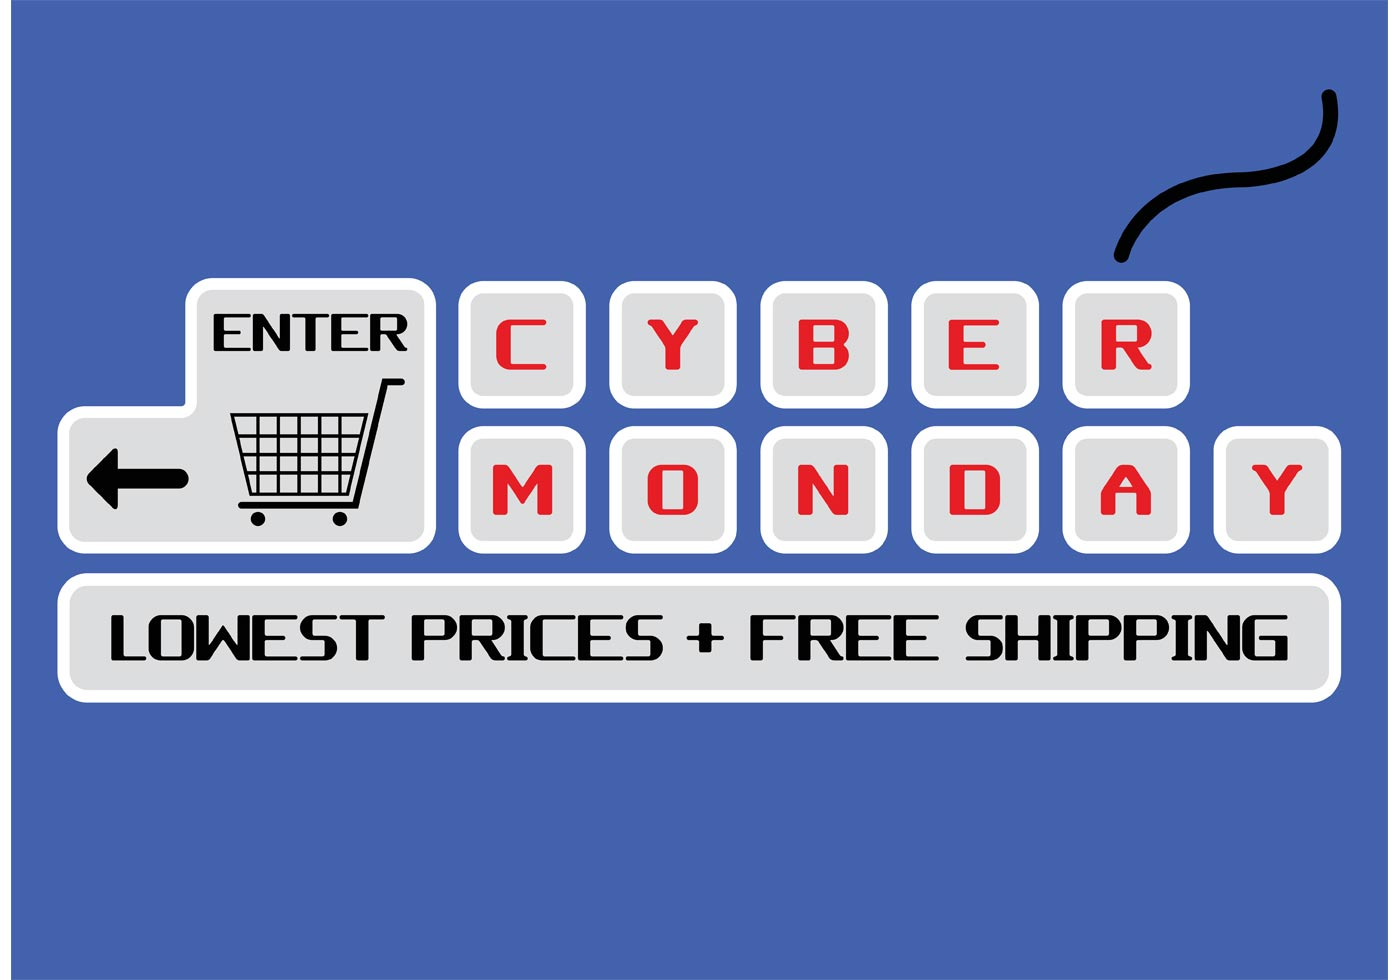 Cyber Monday Vector Download Free Vector Art Stock